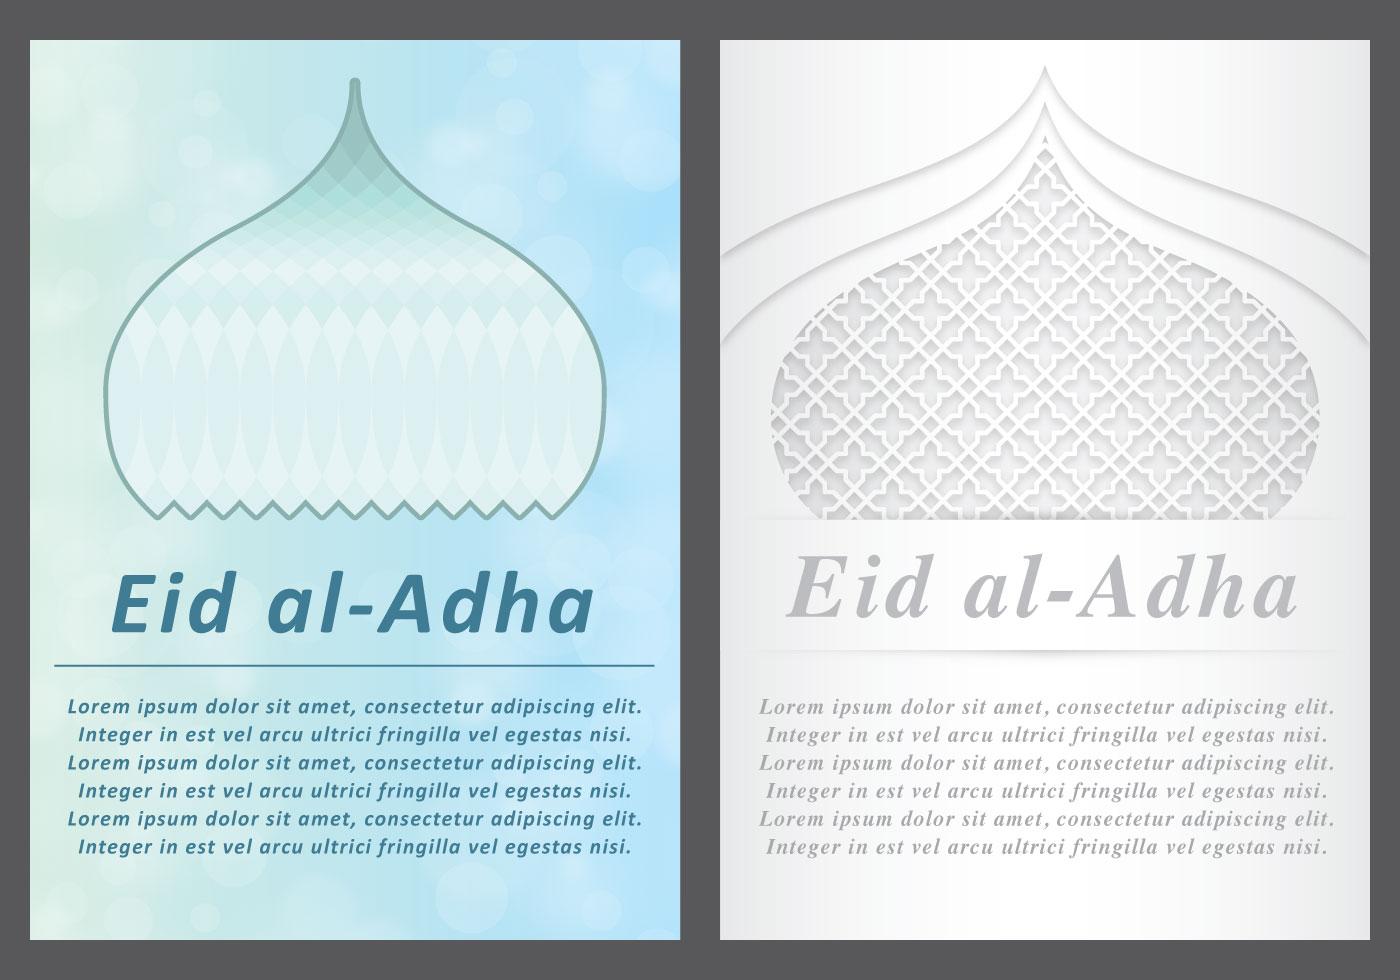 wallpaper eid al adha